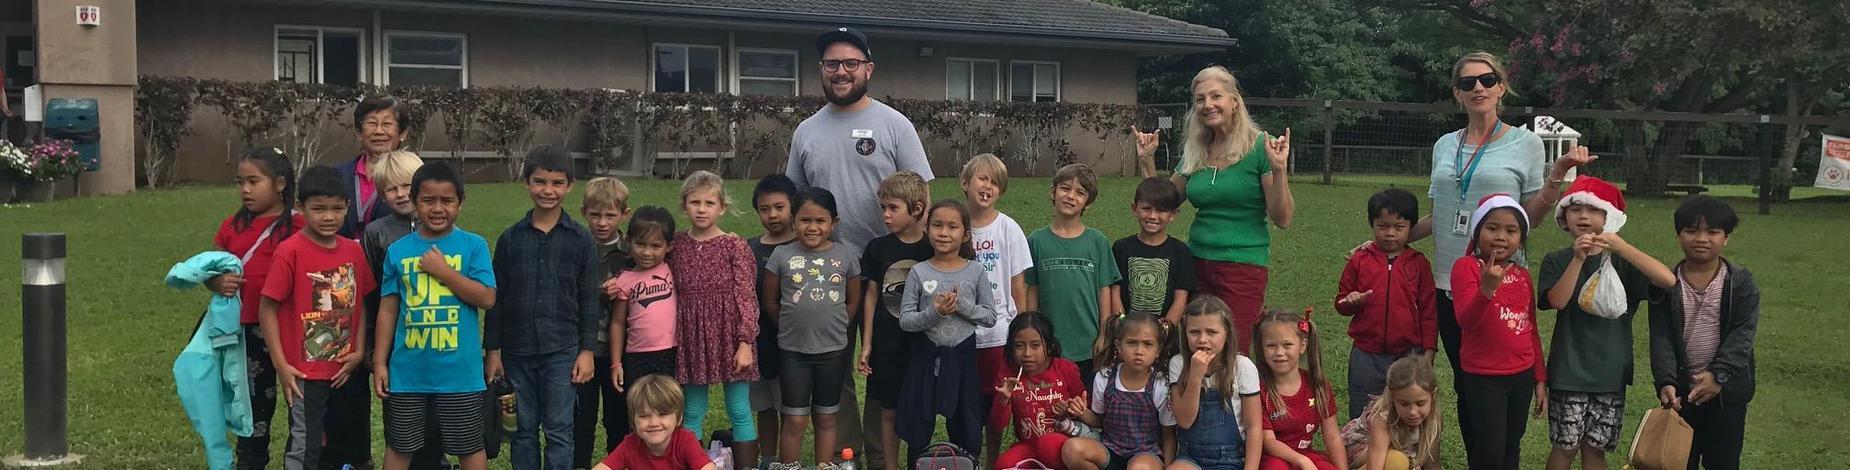 1st Grade Kaua'i humane society Excursion